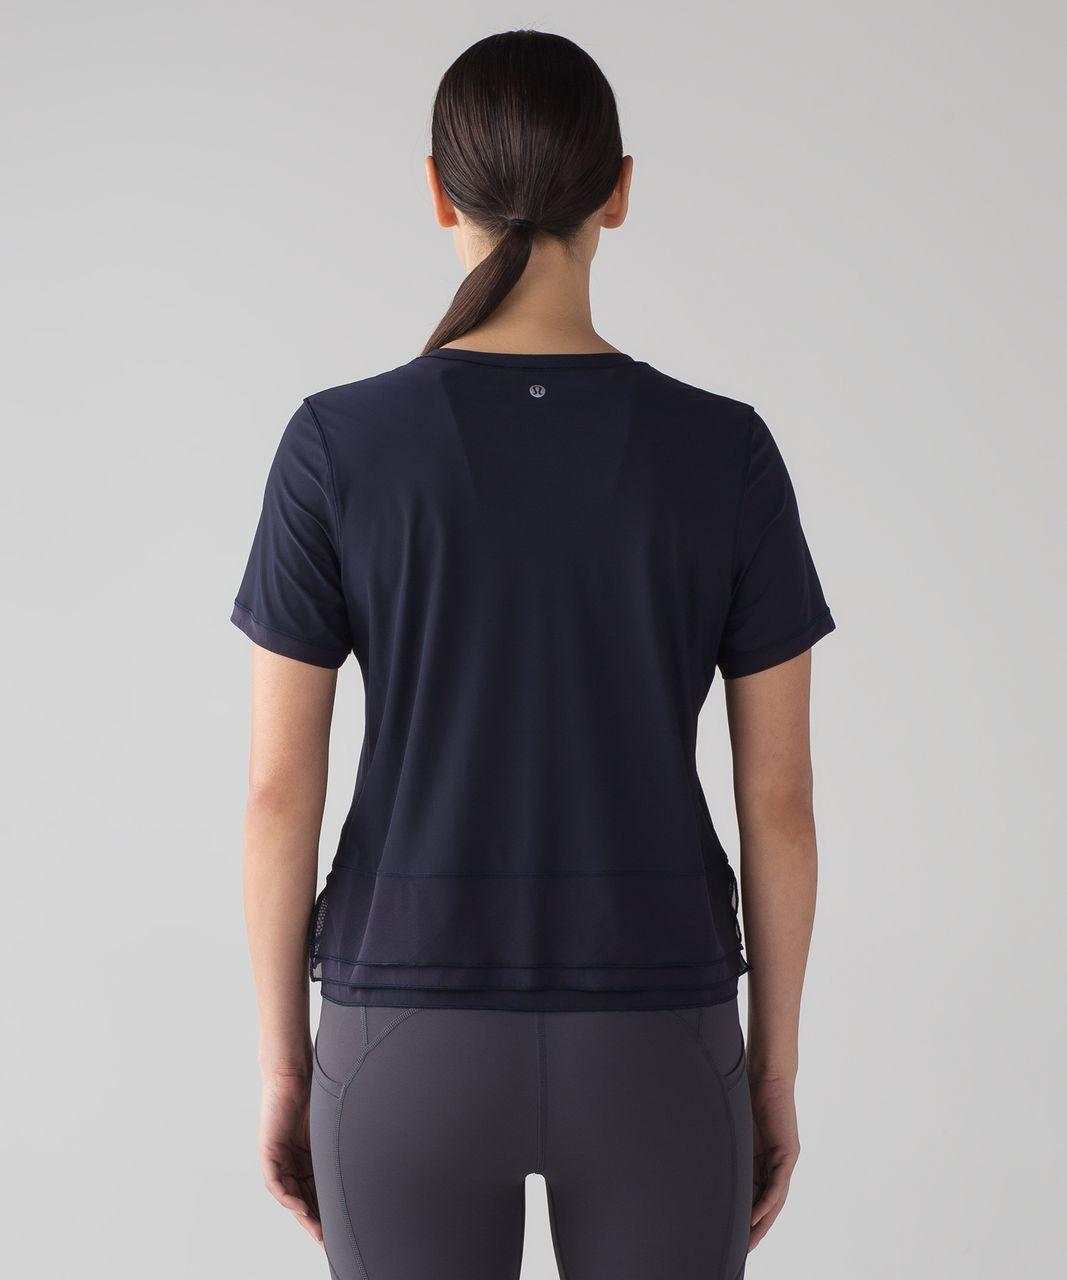 Lululemon Sole Training Short Sleeve - Midnight Navy